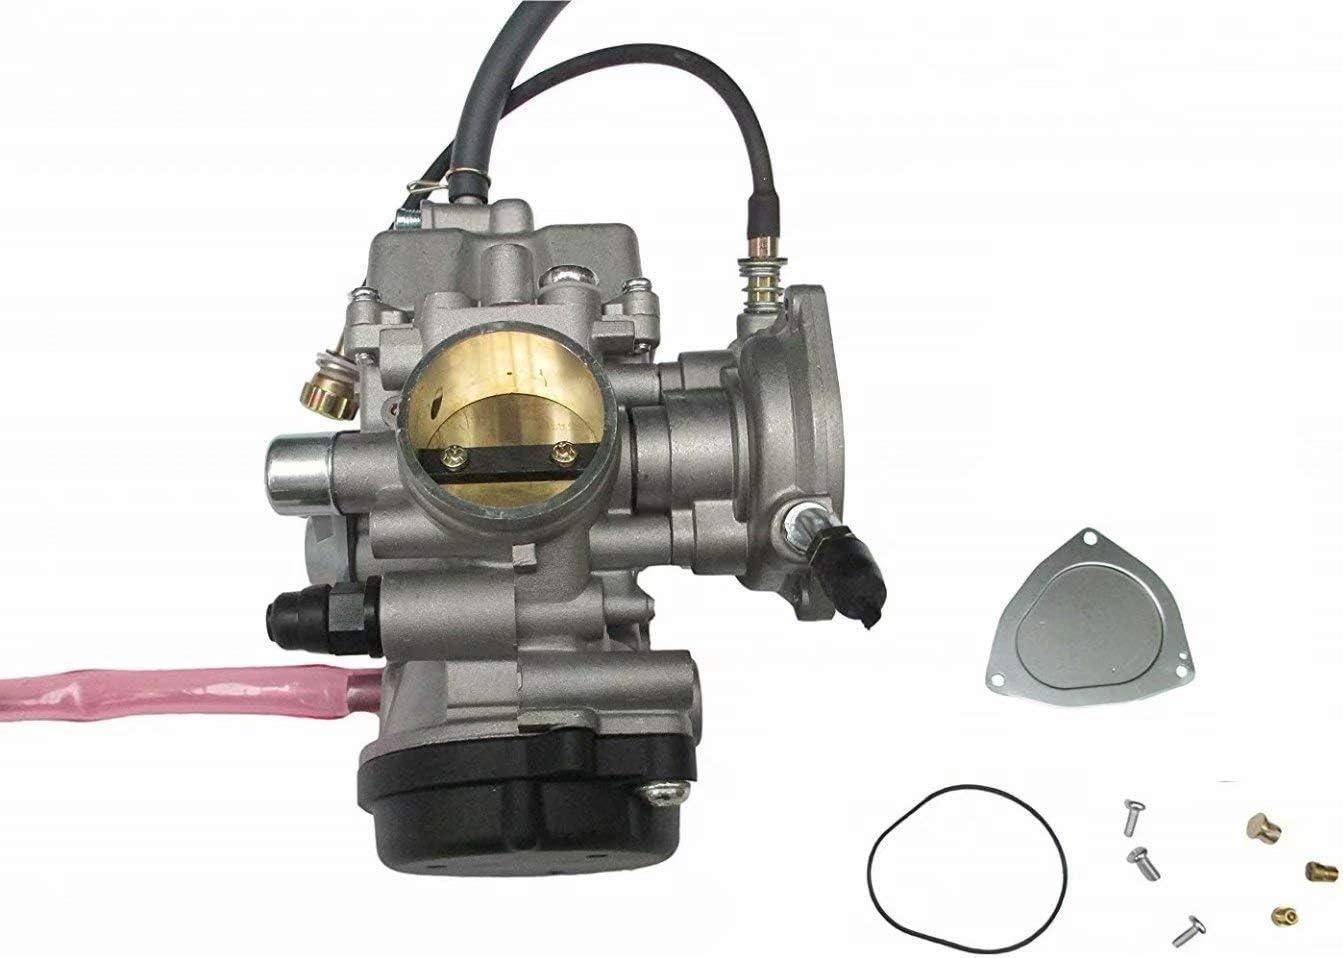 Max 56% OFF Performance New Carburetor Super beauty product restock quality top for Yamaha 450 Yfm4 YFM Wolverine